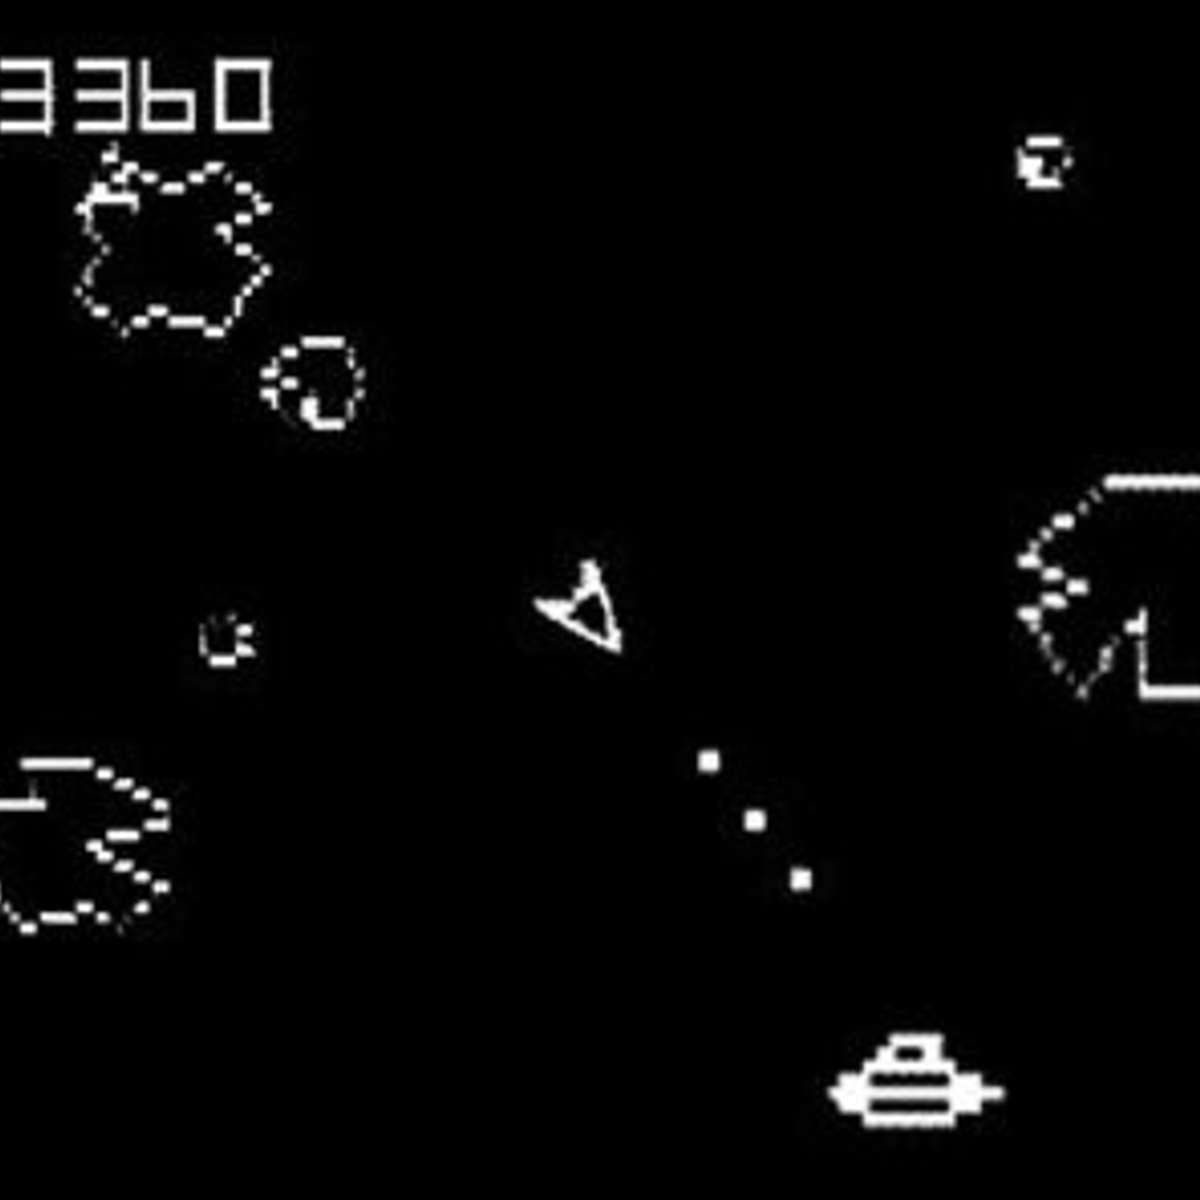 asteroids_game_0.jpeg